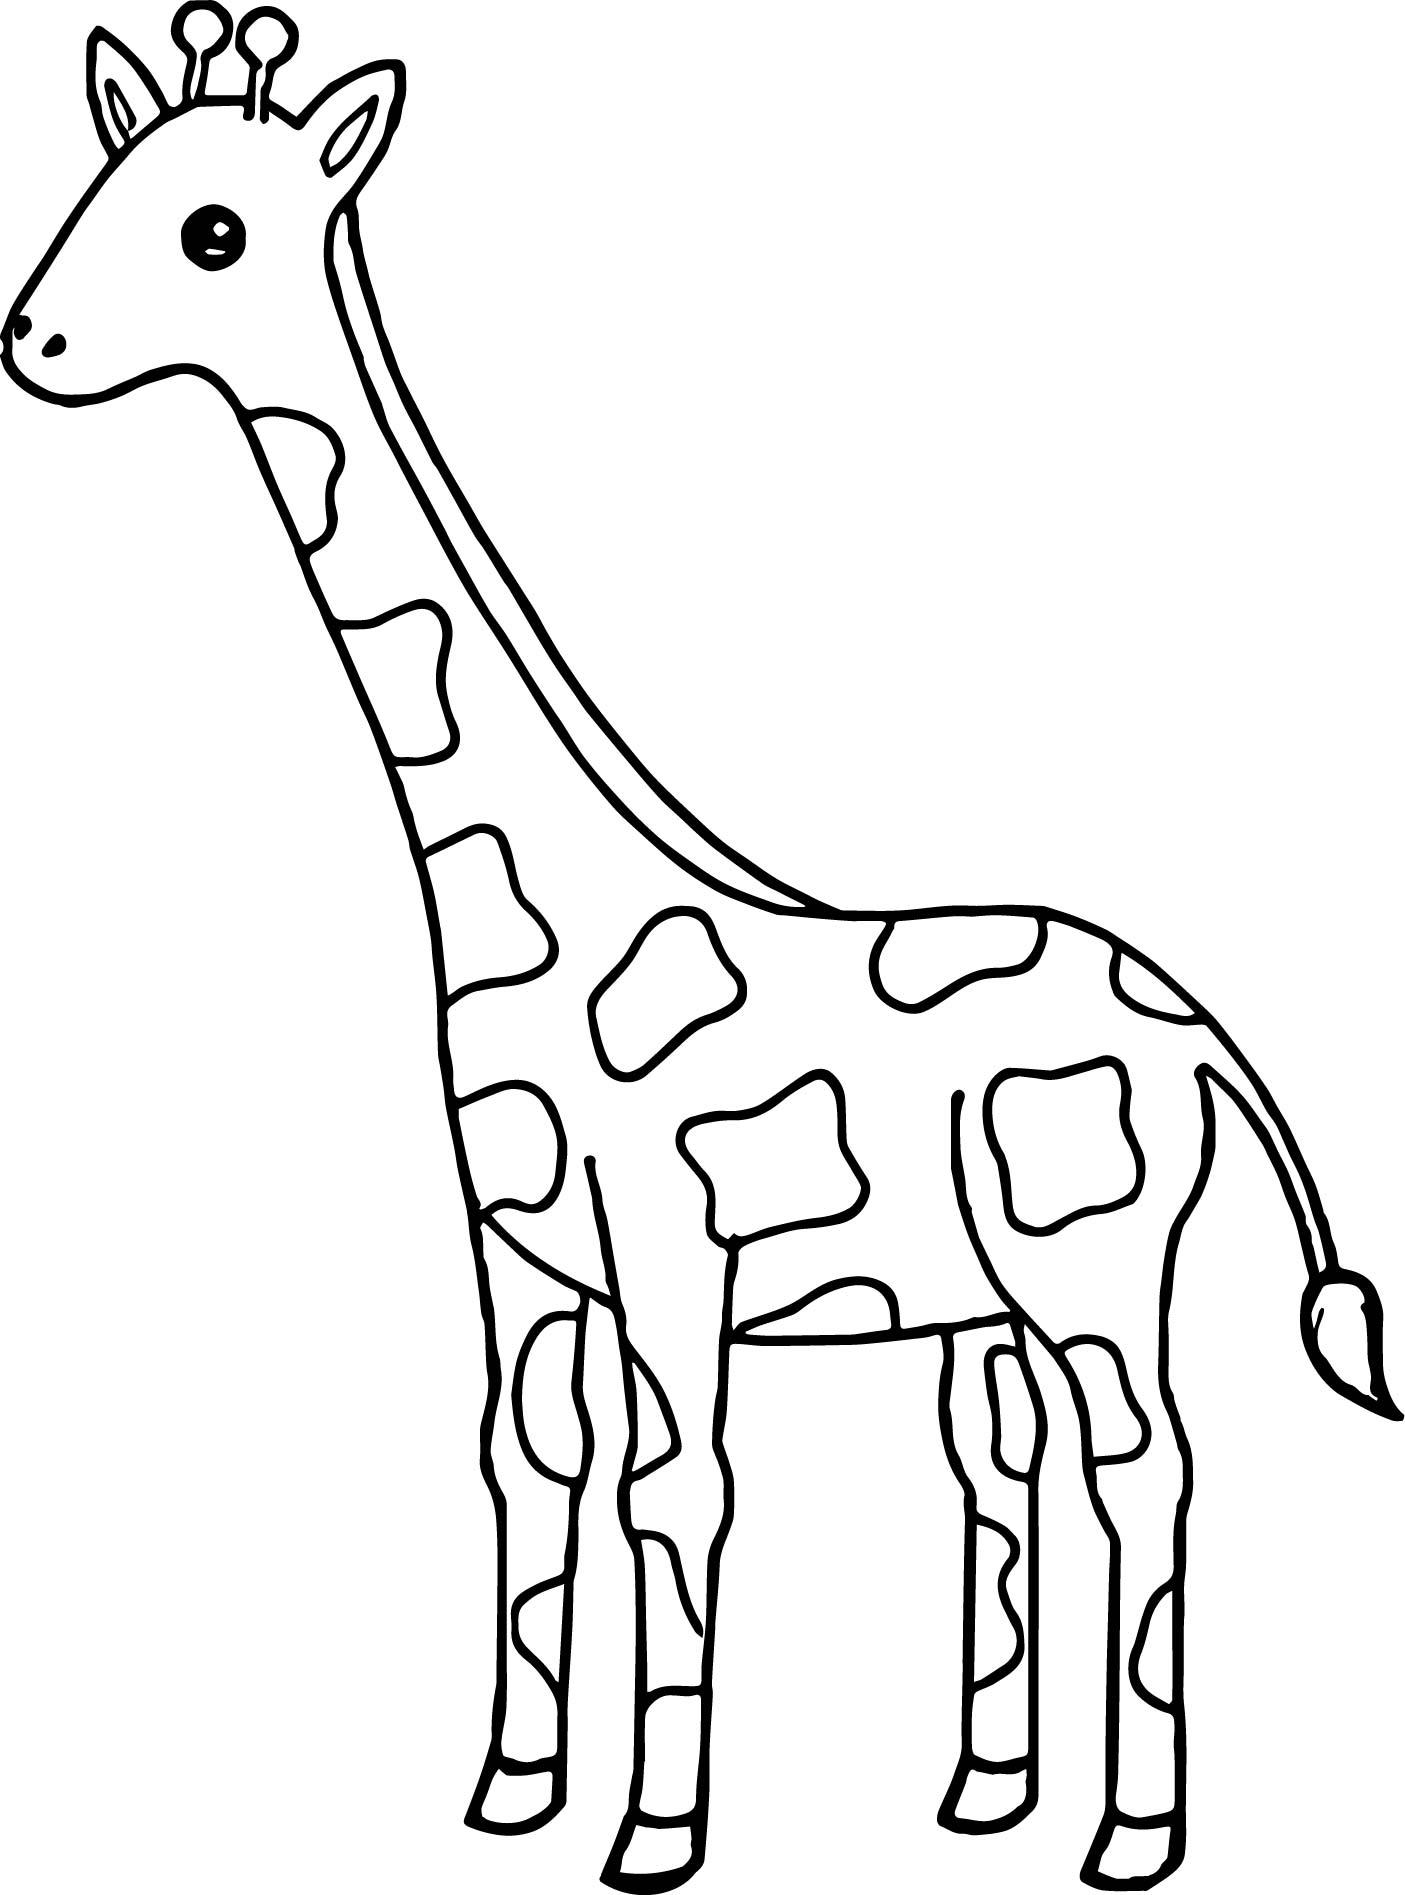 1405x1895 Giraffes Coloring Pages Giraffe Eating Banana Coloring Page Free